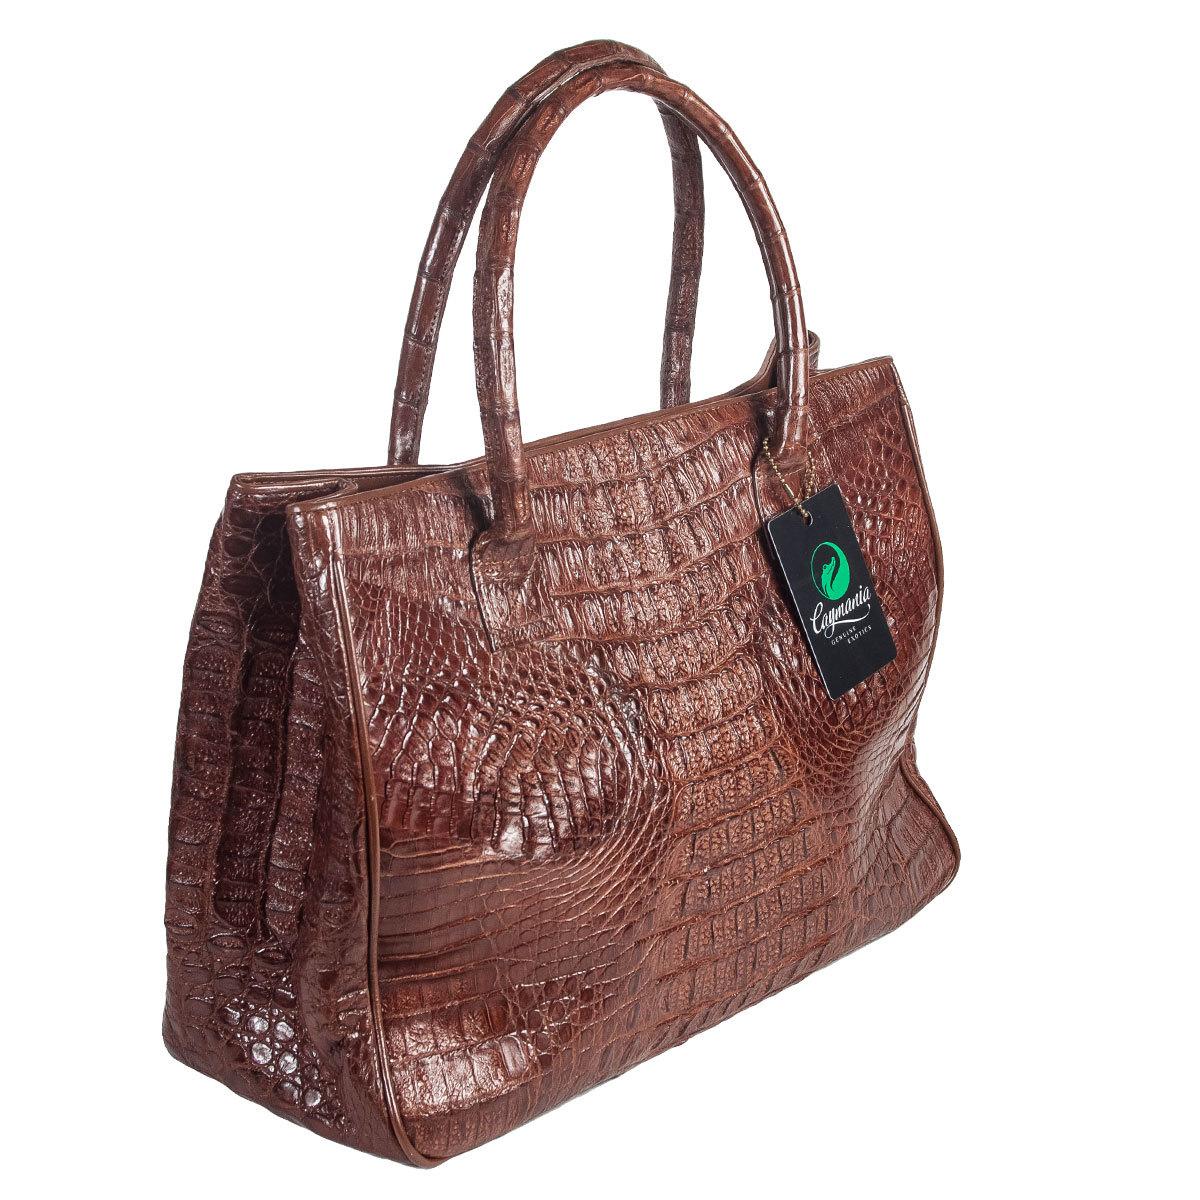 880ad5e52956 Женская сумка из кожи крокодила коричневая | Артикул: WHC7134BR